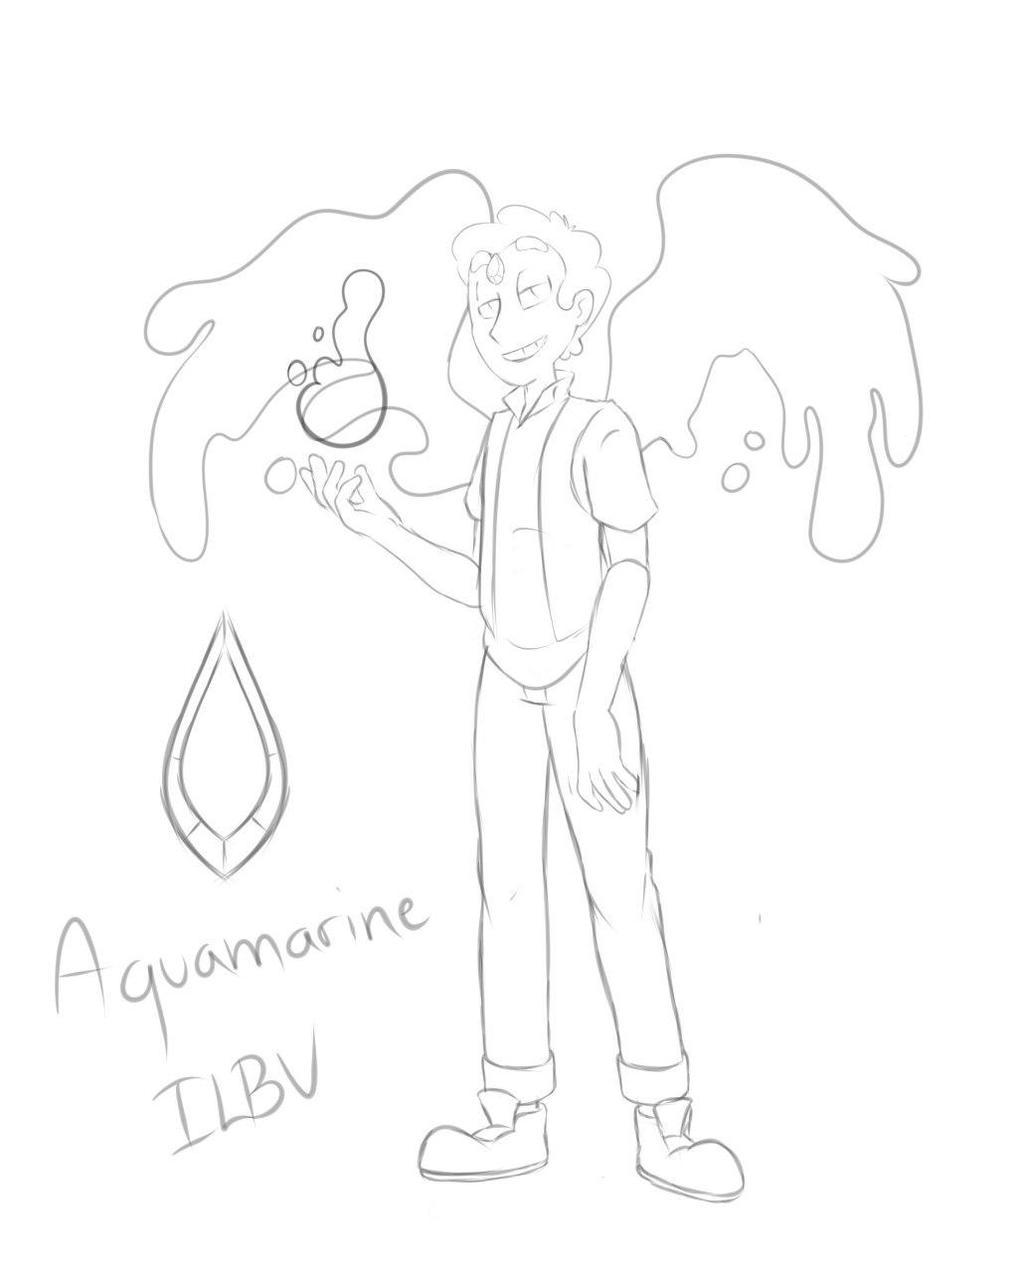 Aquamarine ilbv